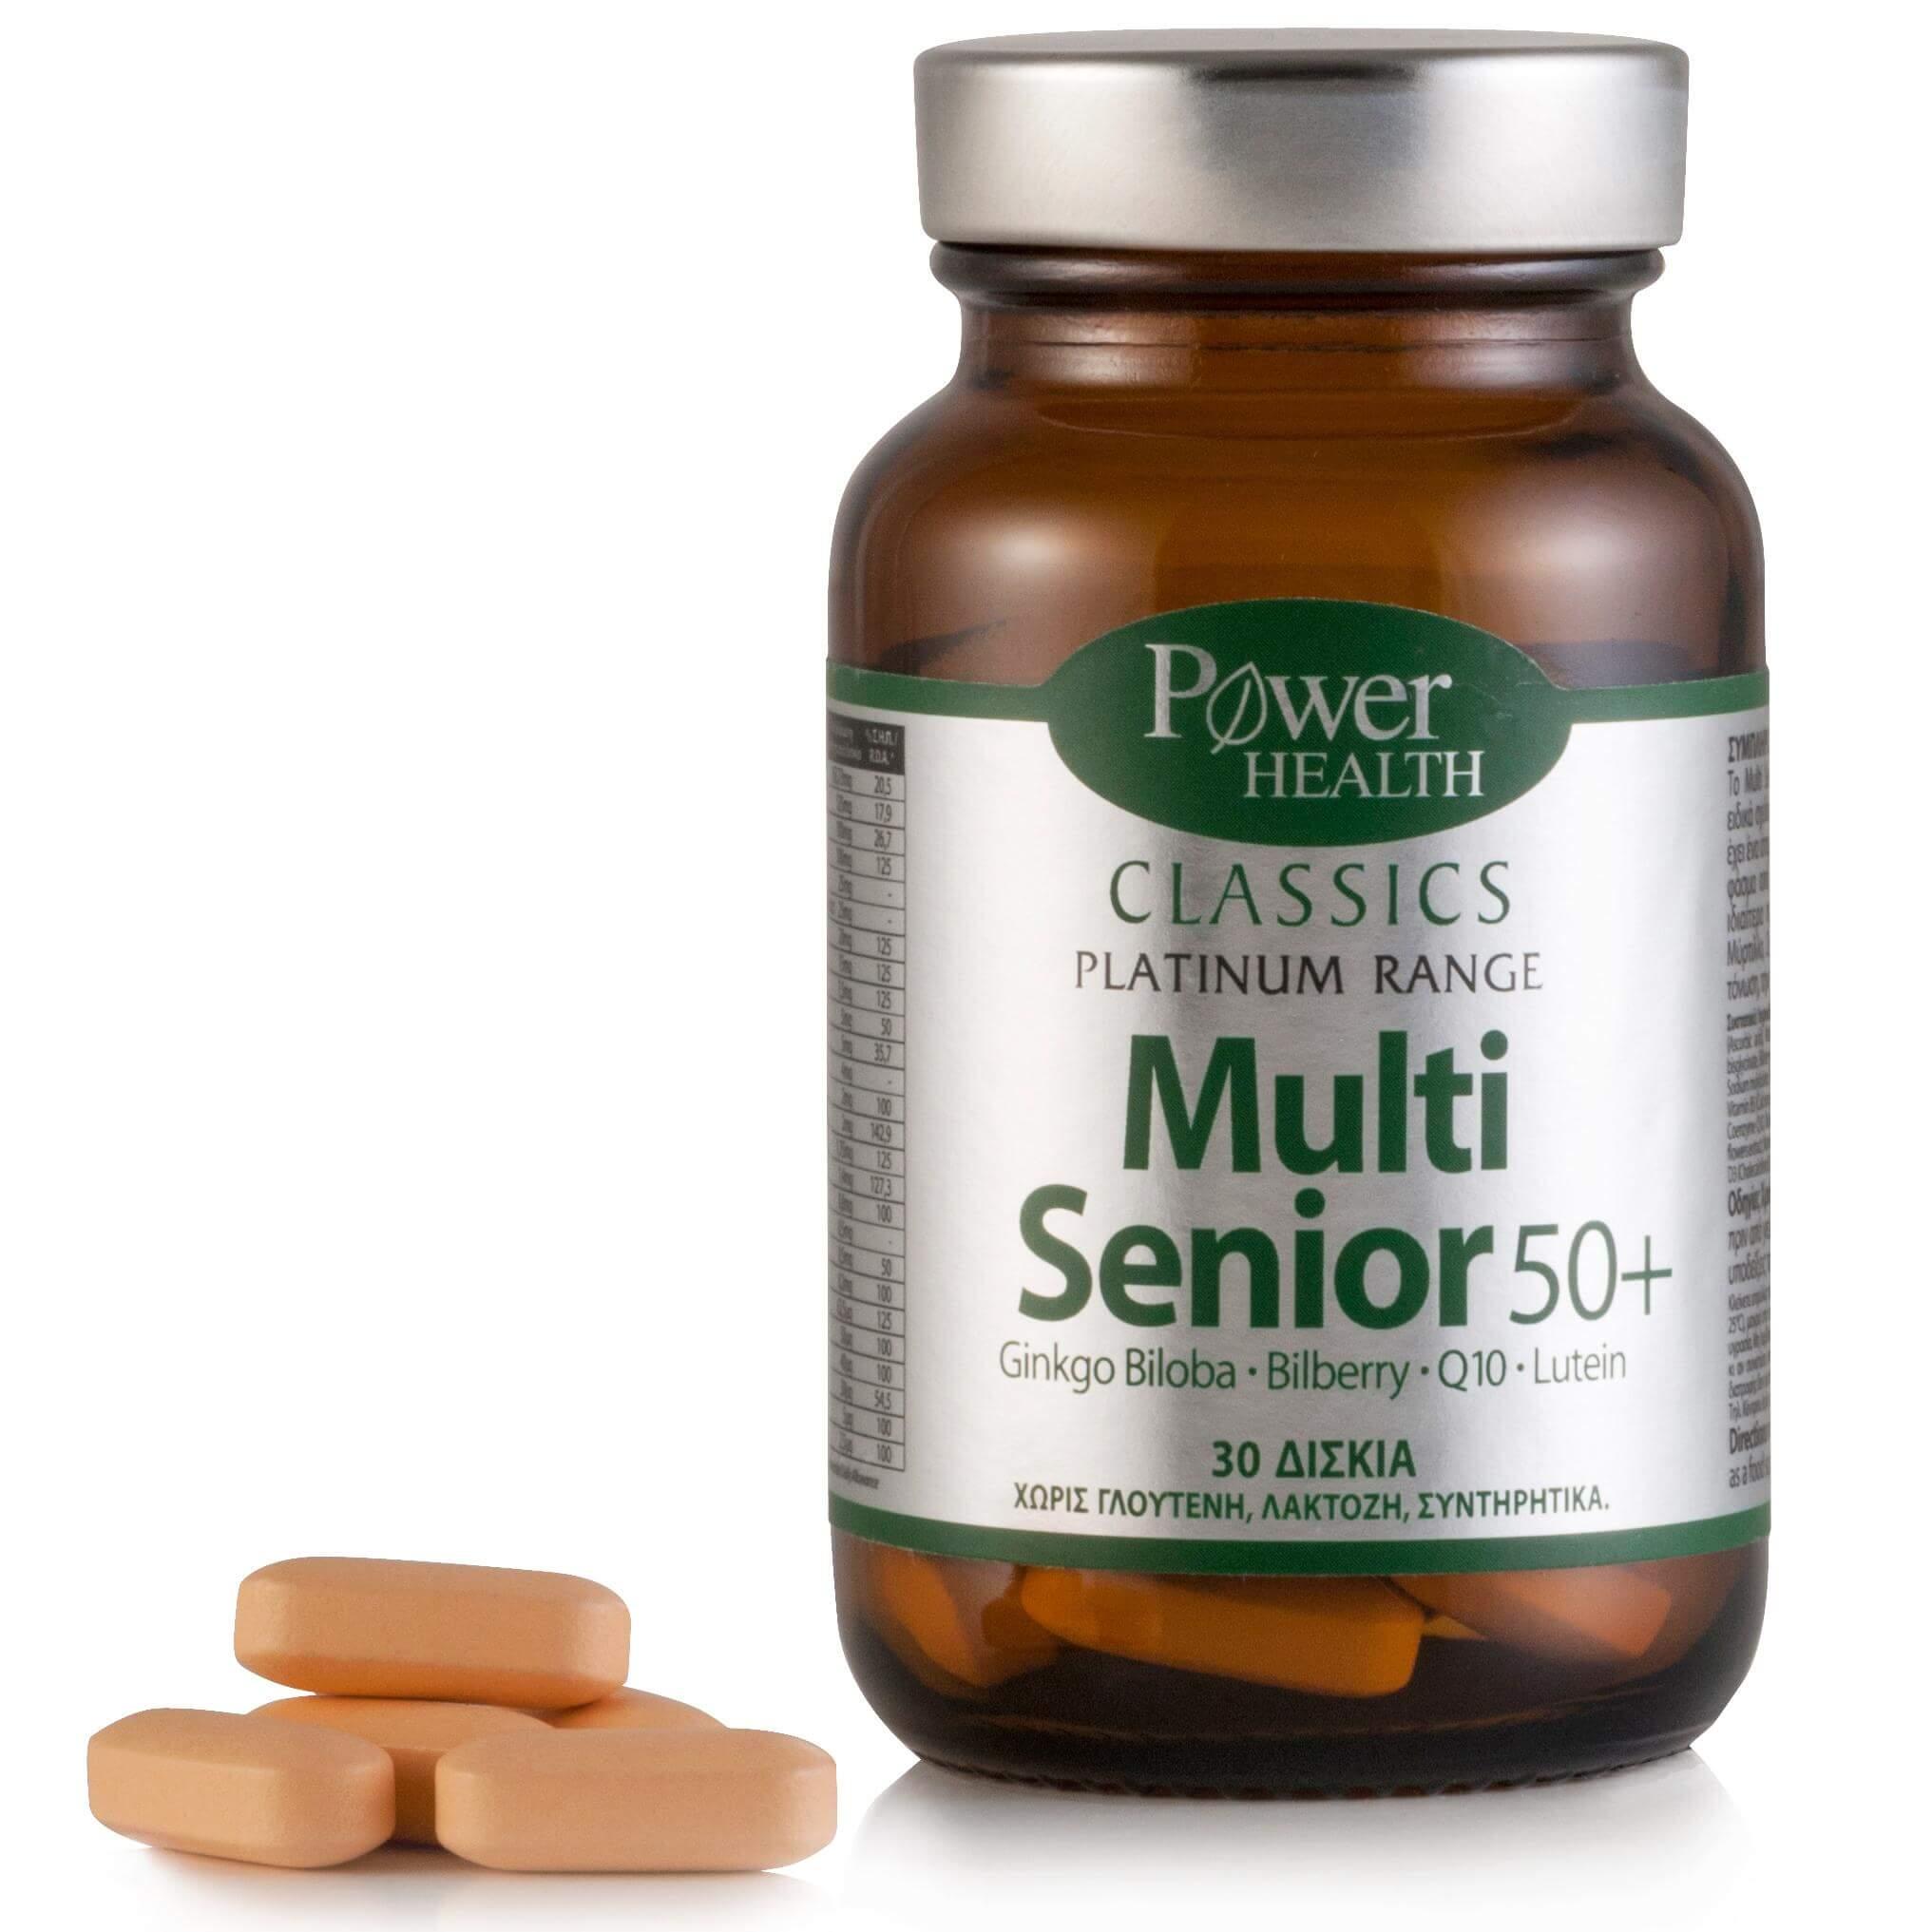 Power Health Platinum Multi Senior 50+ Πολυβιταμινούχο Συμπλήρωμα Διατροφής Ειδικά Σχεδιασμένο για Ανθρώπους Ηλικίας 50+ 30tabs